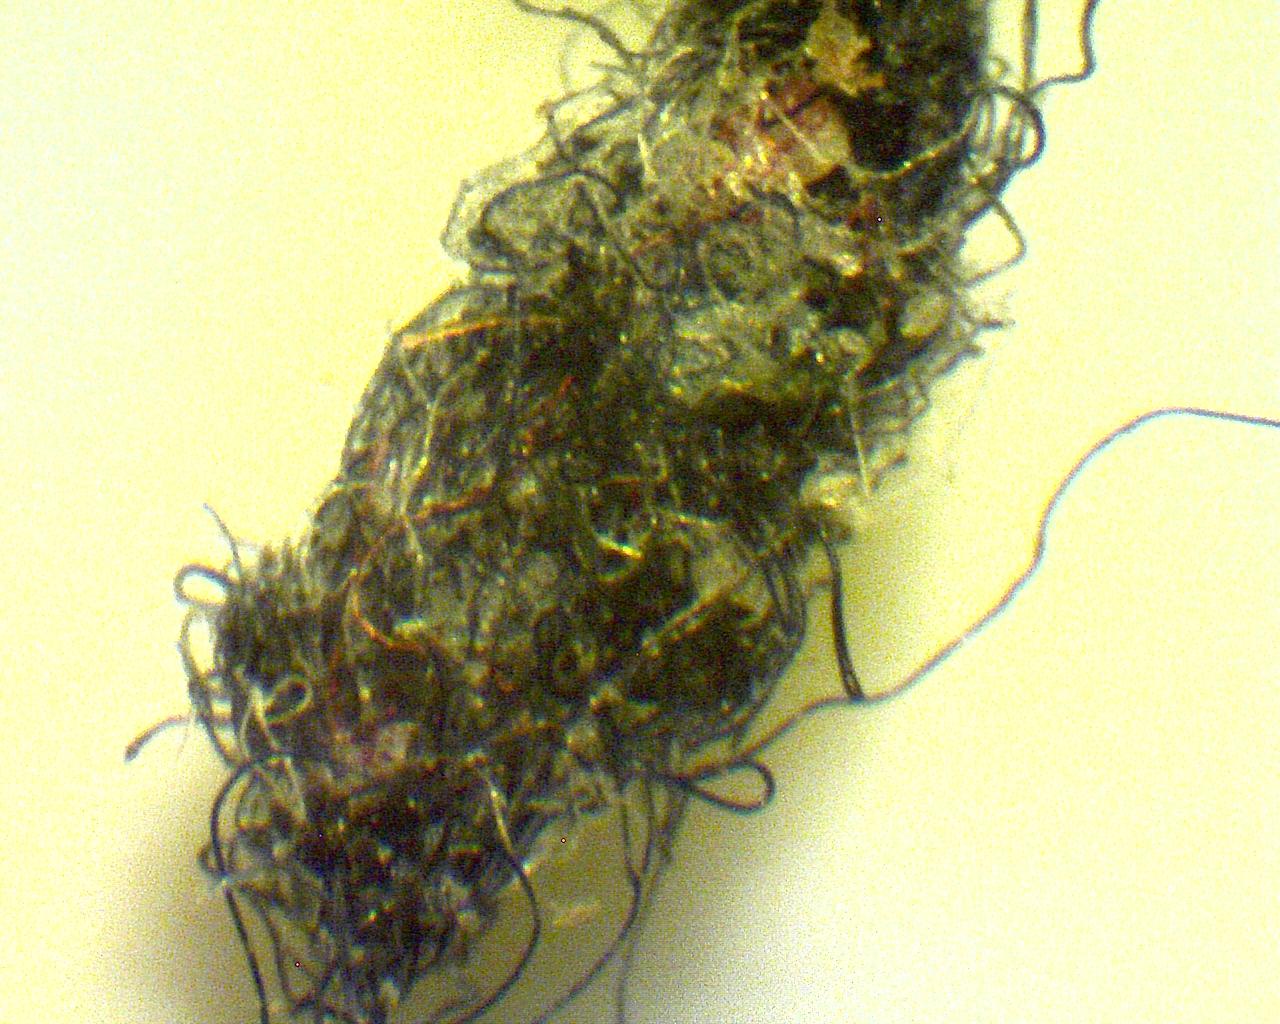 https://www.curezone.org/upload/Parasites/Large_Blackhead.jpg